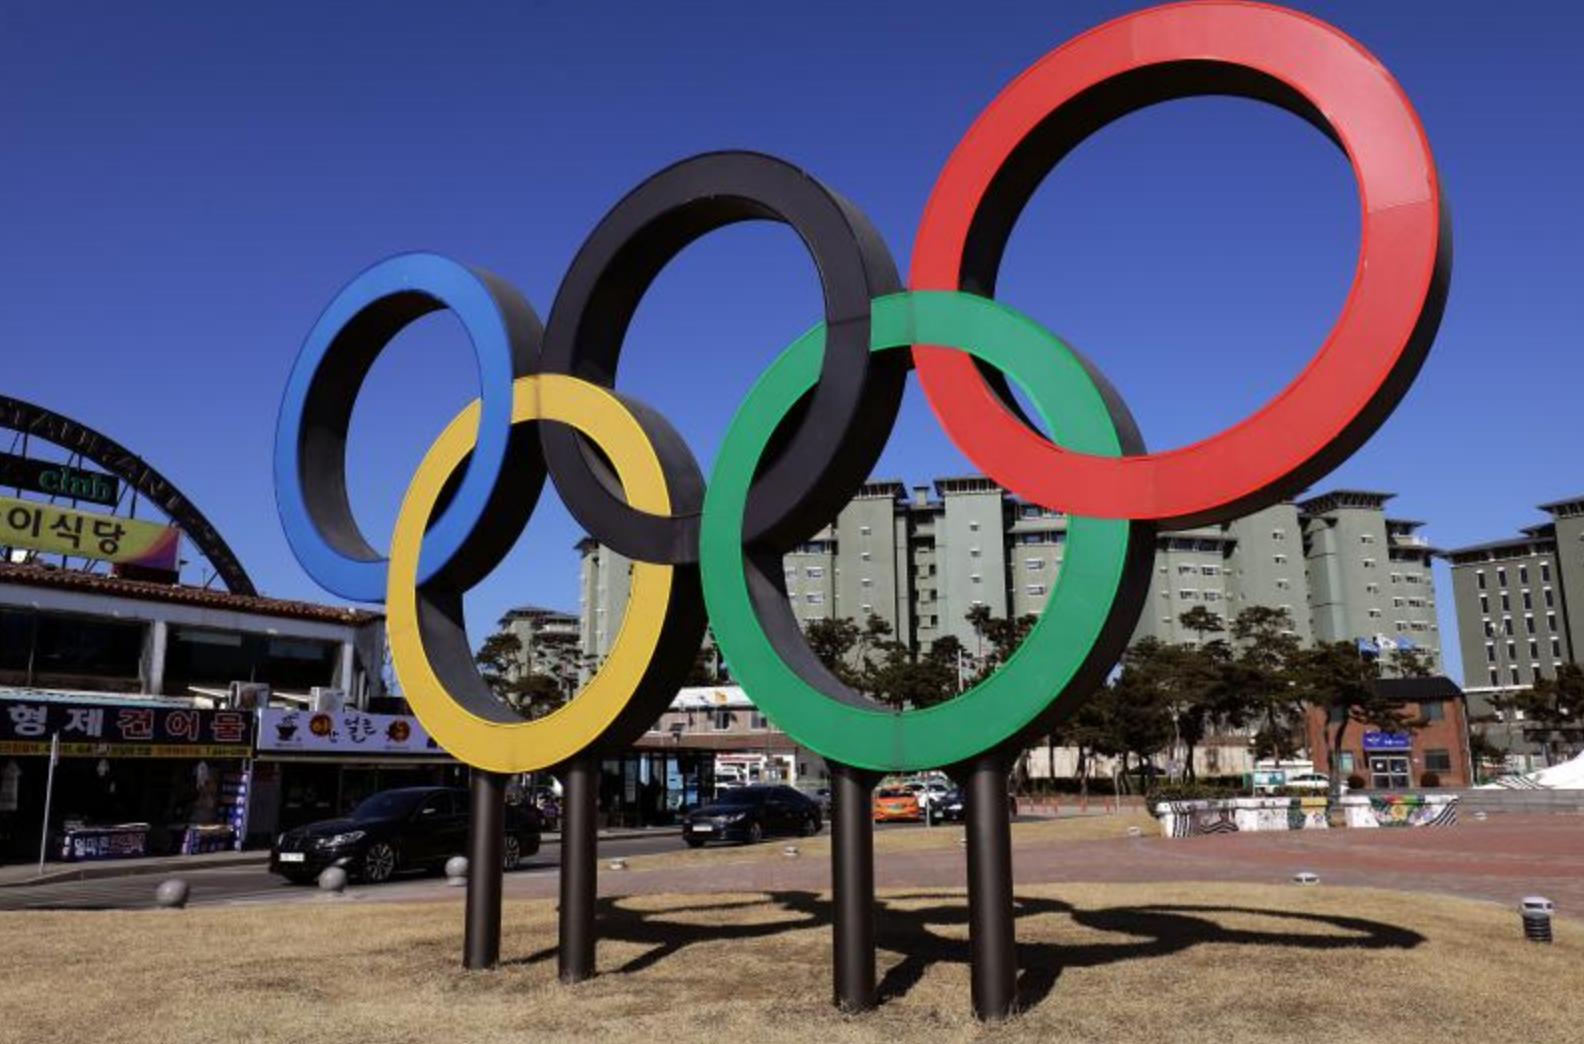 Los Angeles to Host 2028 Olympics